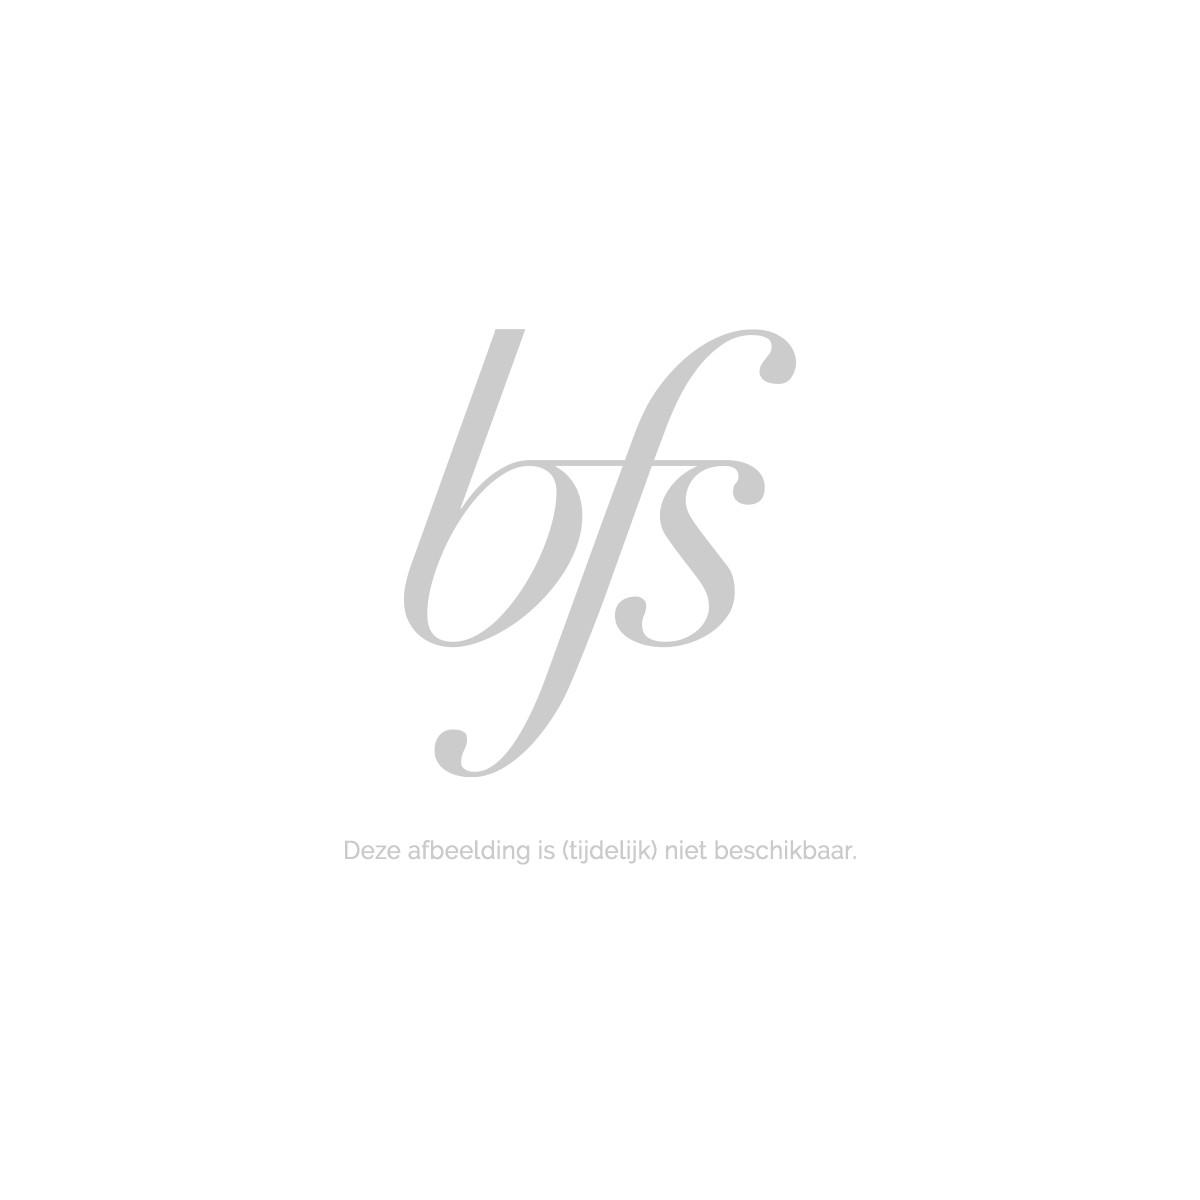 Shiseido Ben. Concentrated Neck Contour Treatment 50 Ml